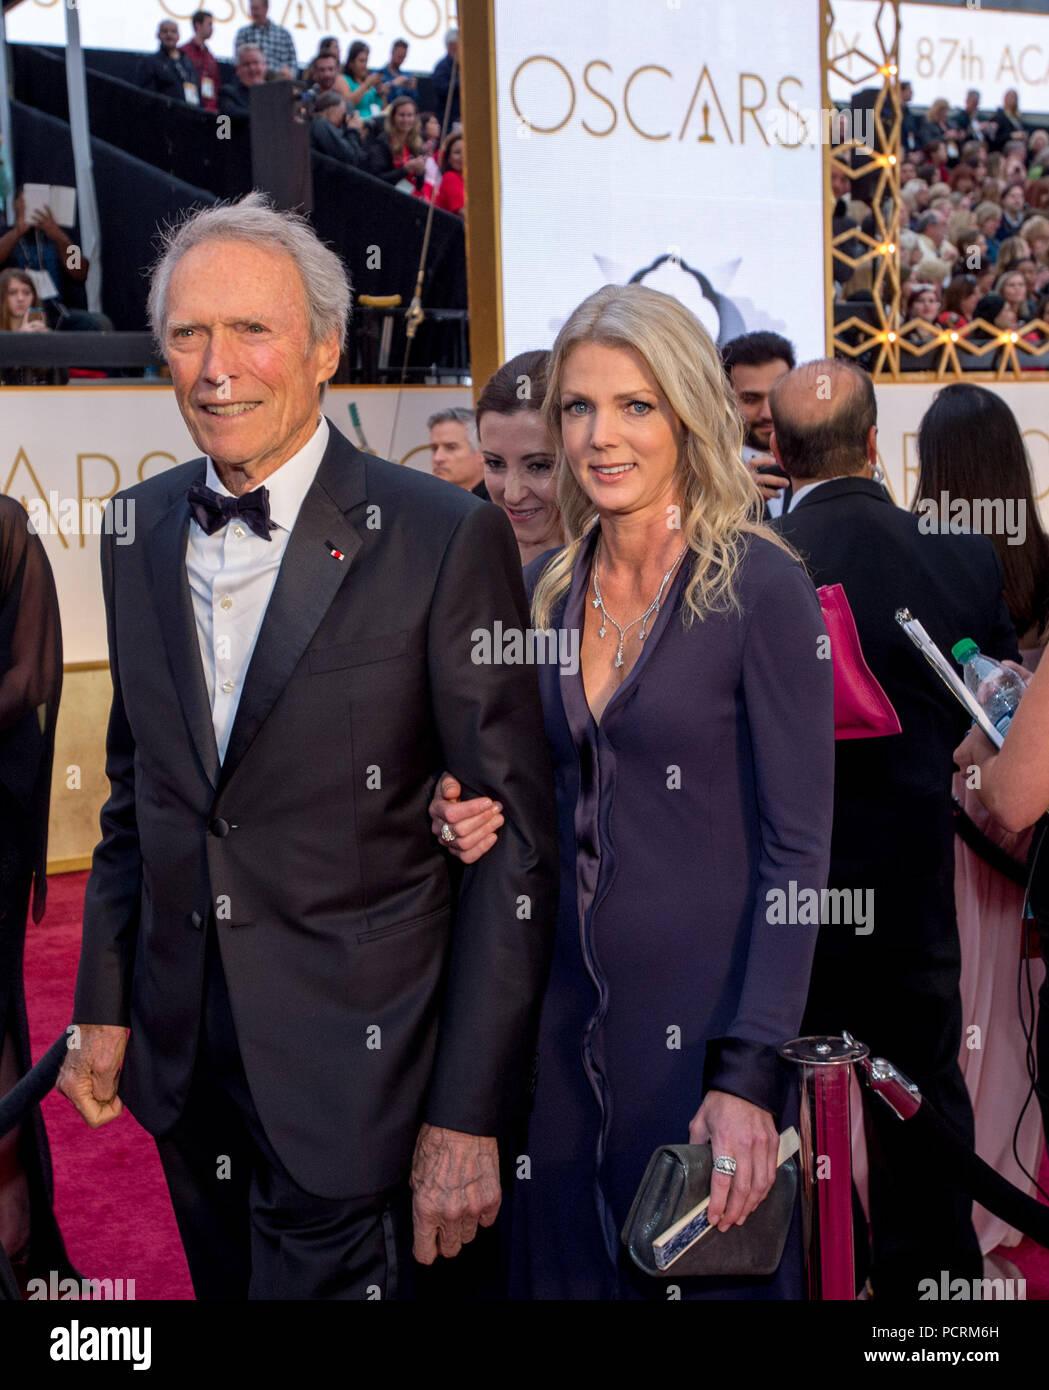 HOLLYWOOD, CA - febbraio 22: Clint Eastwood e Christina Sandera attendst la 87th annuale di Academy Awards di Hollywood & Highland Center il 22 febbraio 2015 in Hollywood, la California. Persone: Clint Eastwood e Christina Sandera Foto Stock